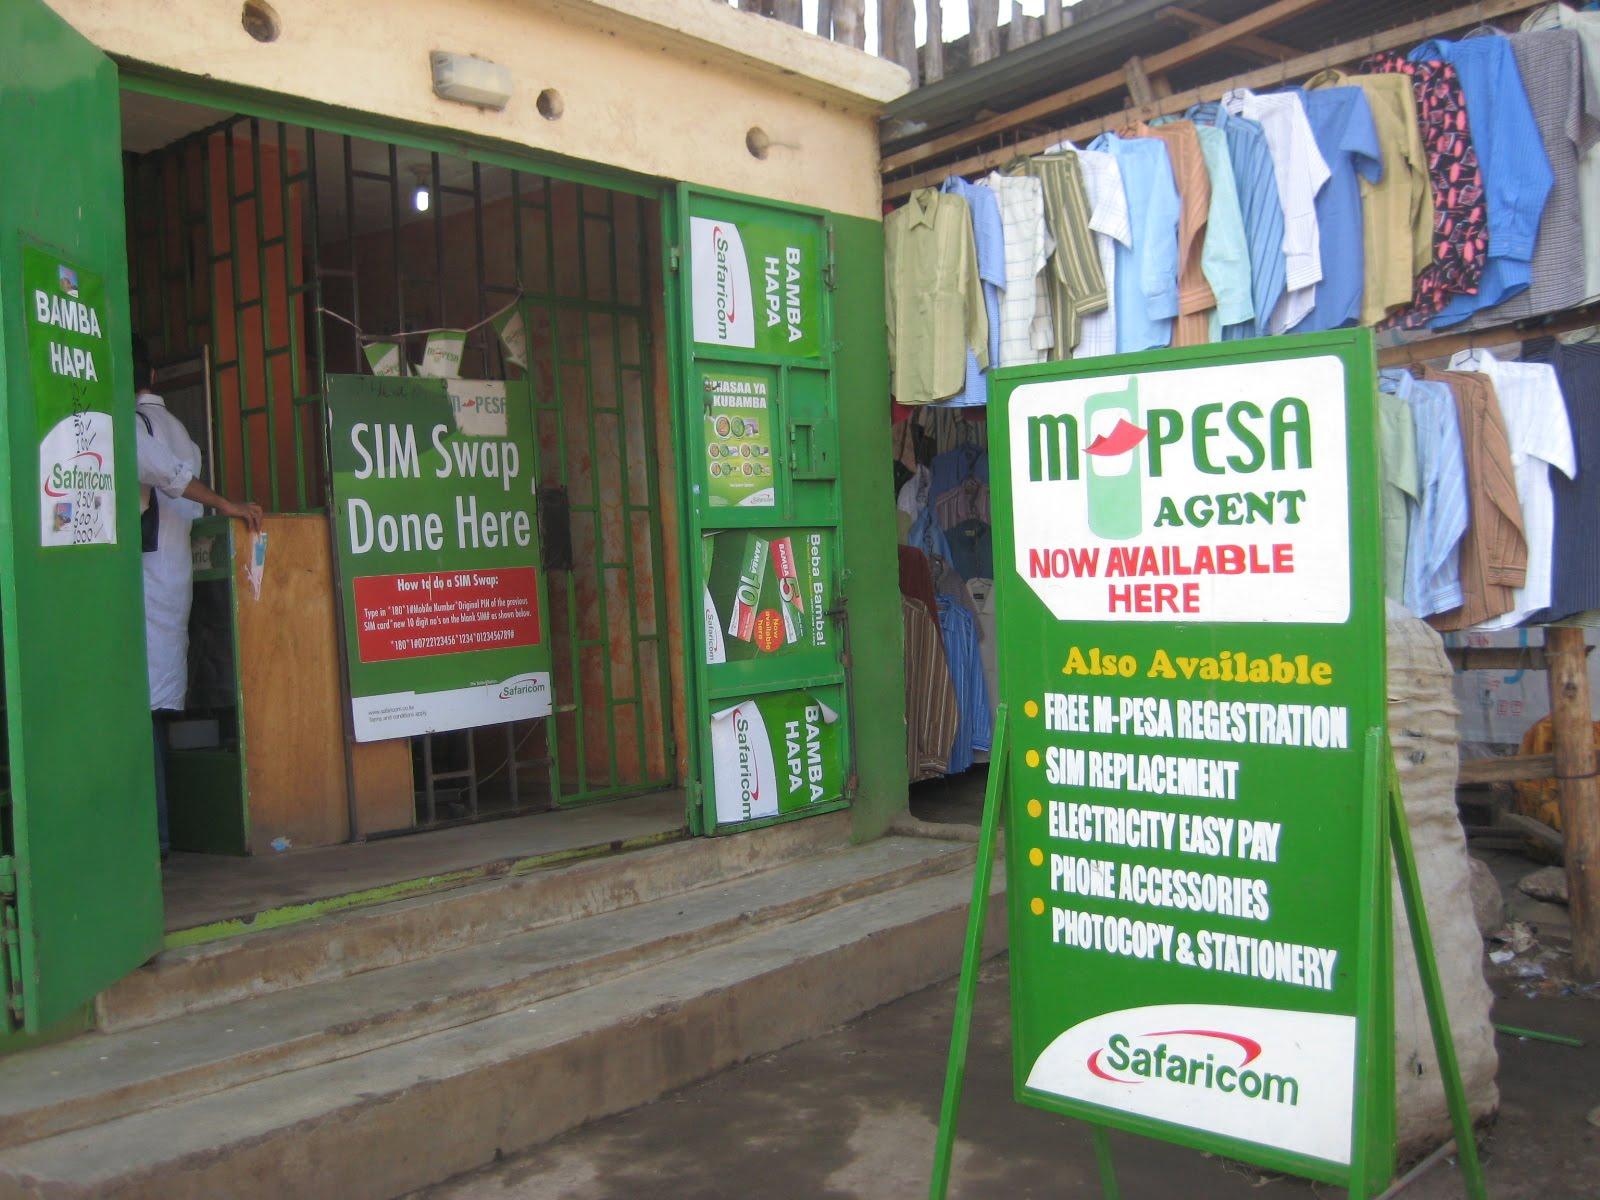 M-Pesa-agent